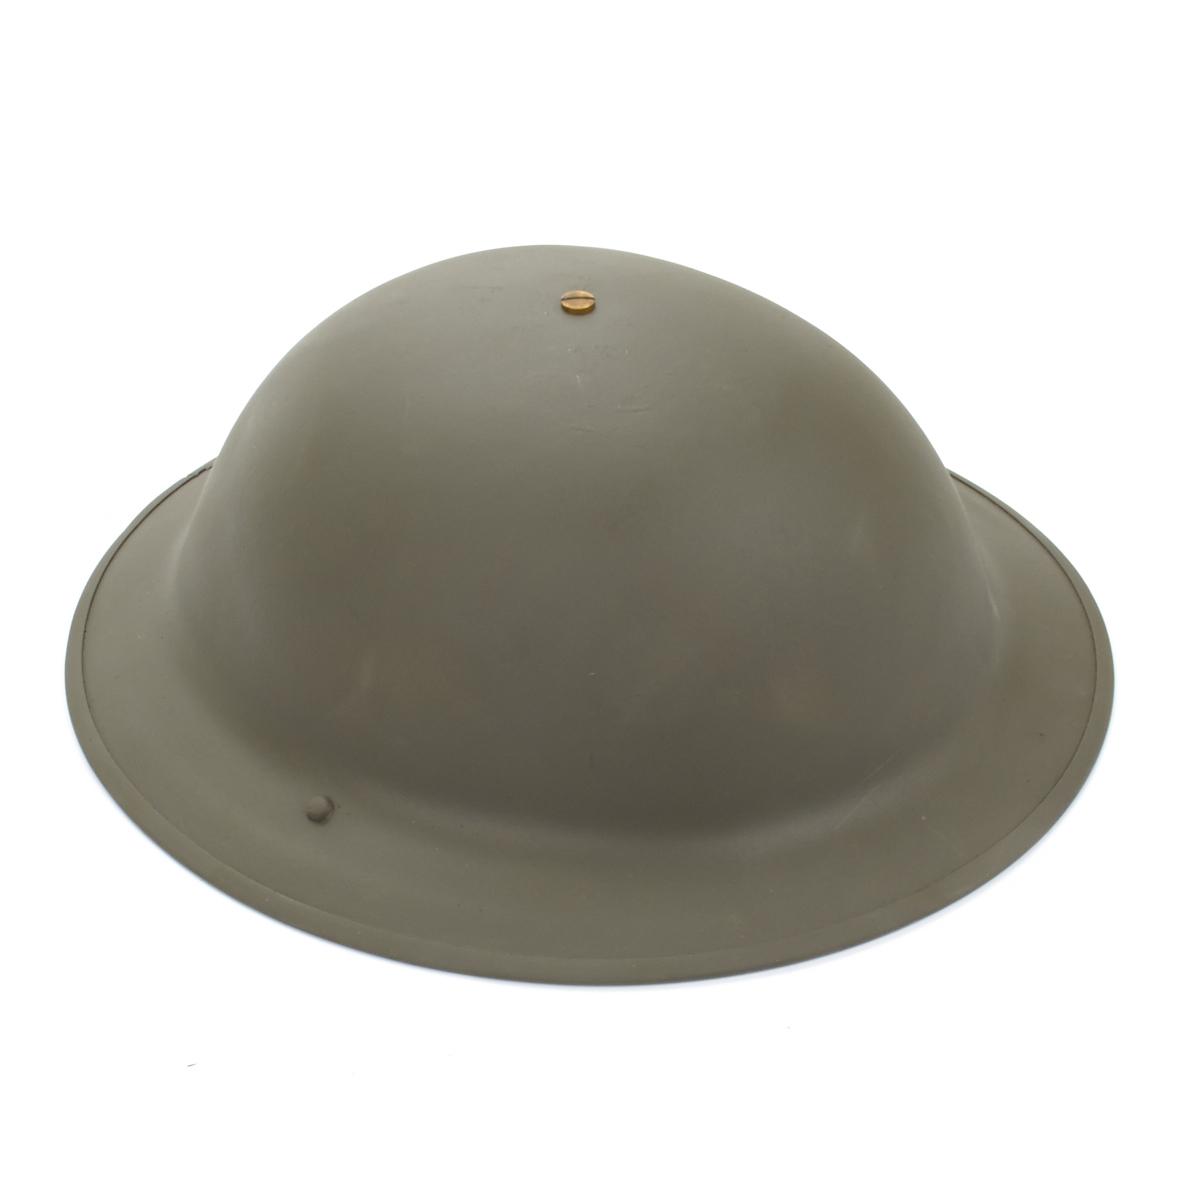 British Brodie helmet